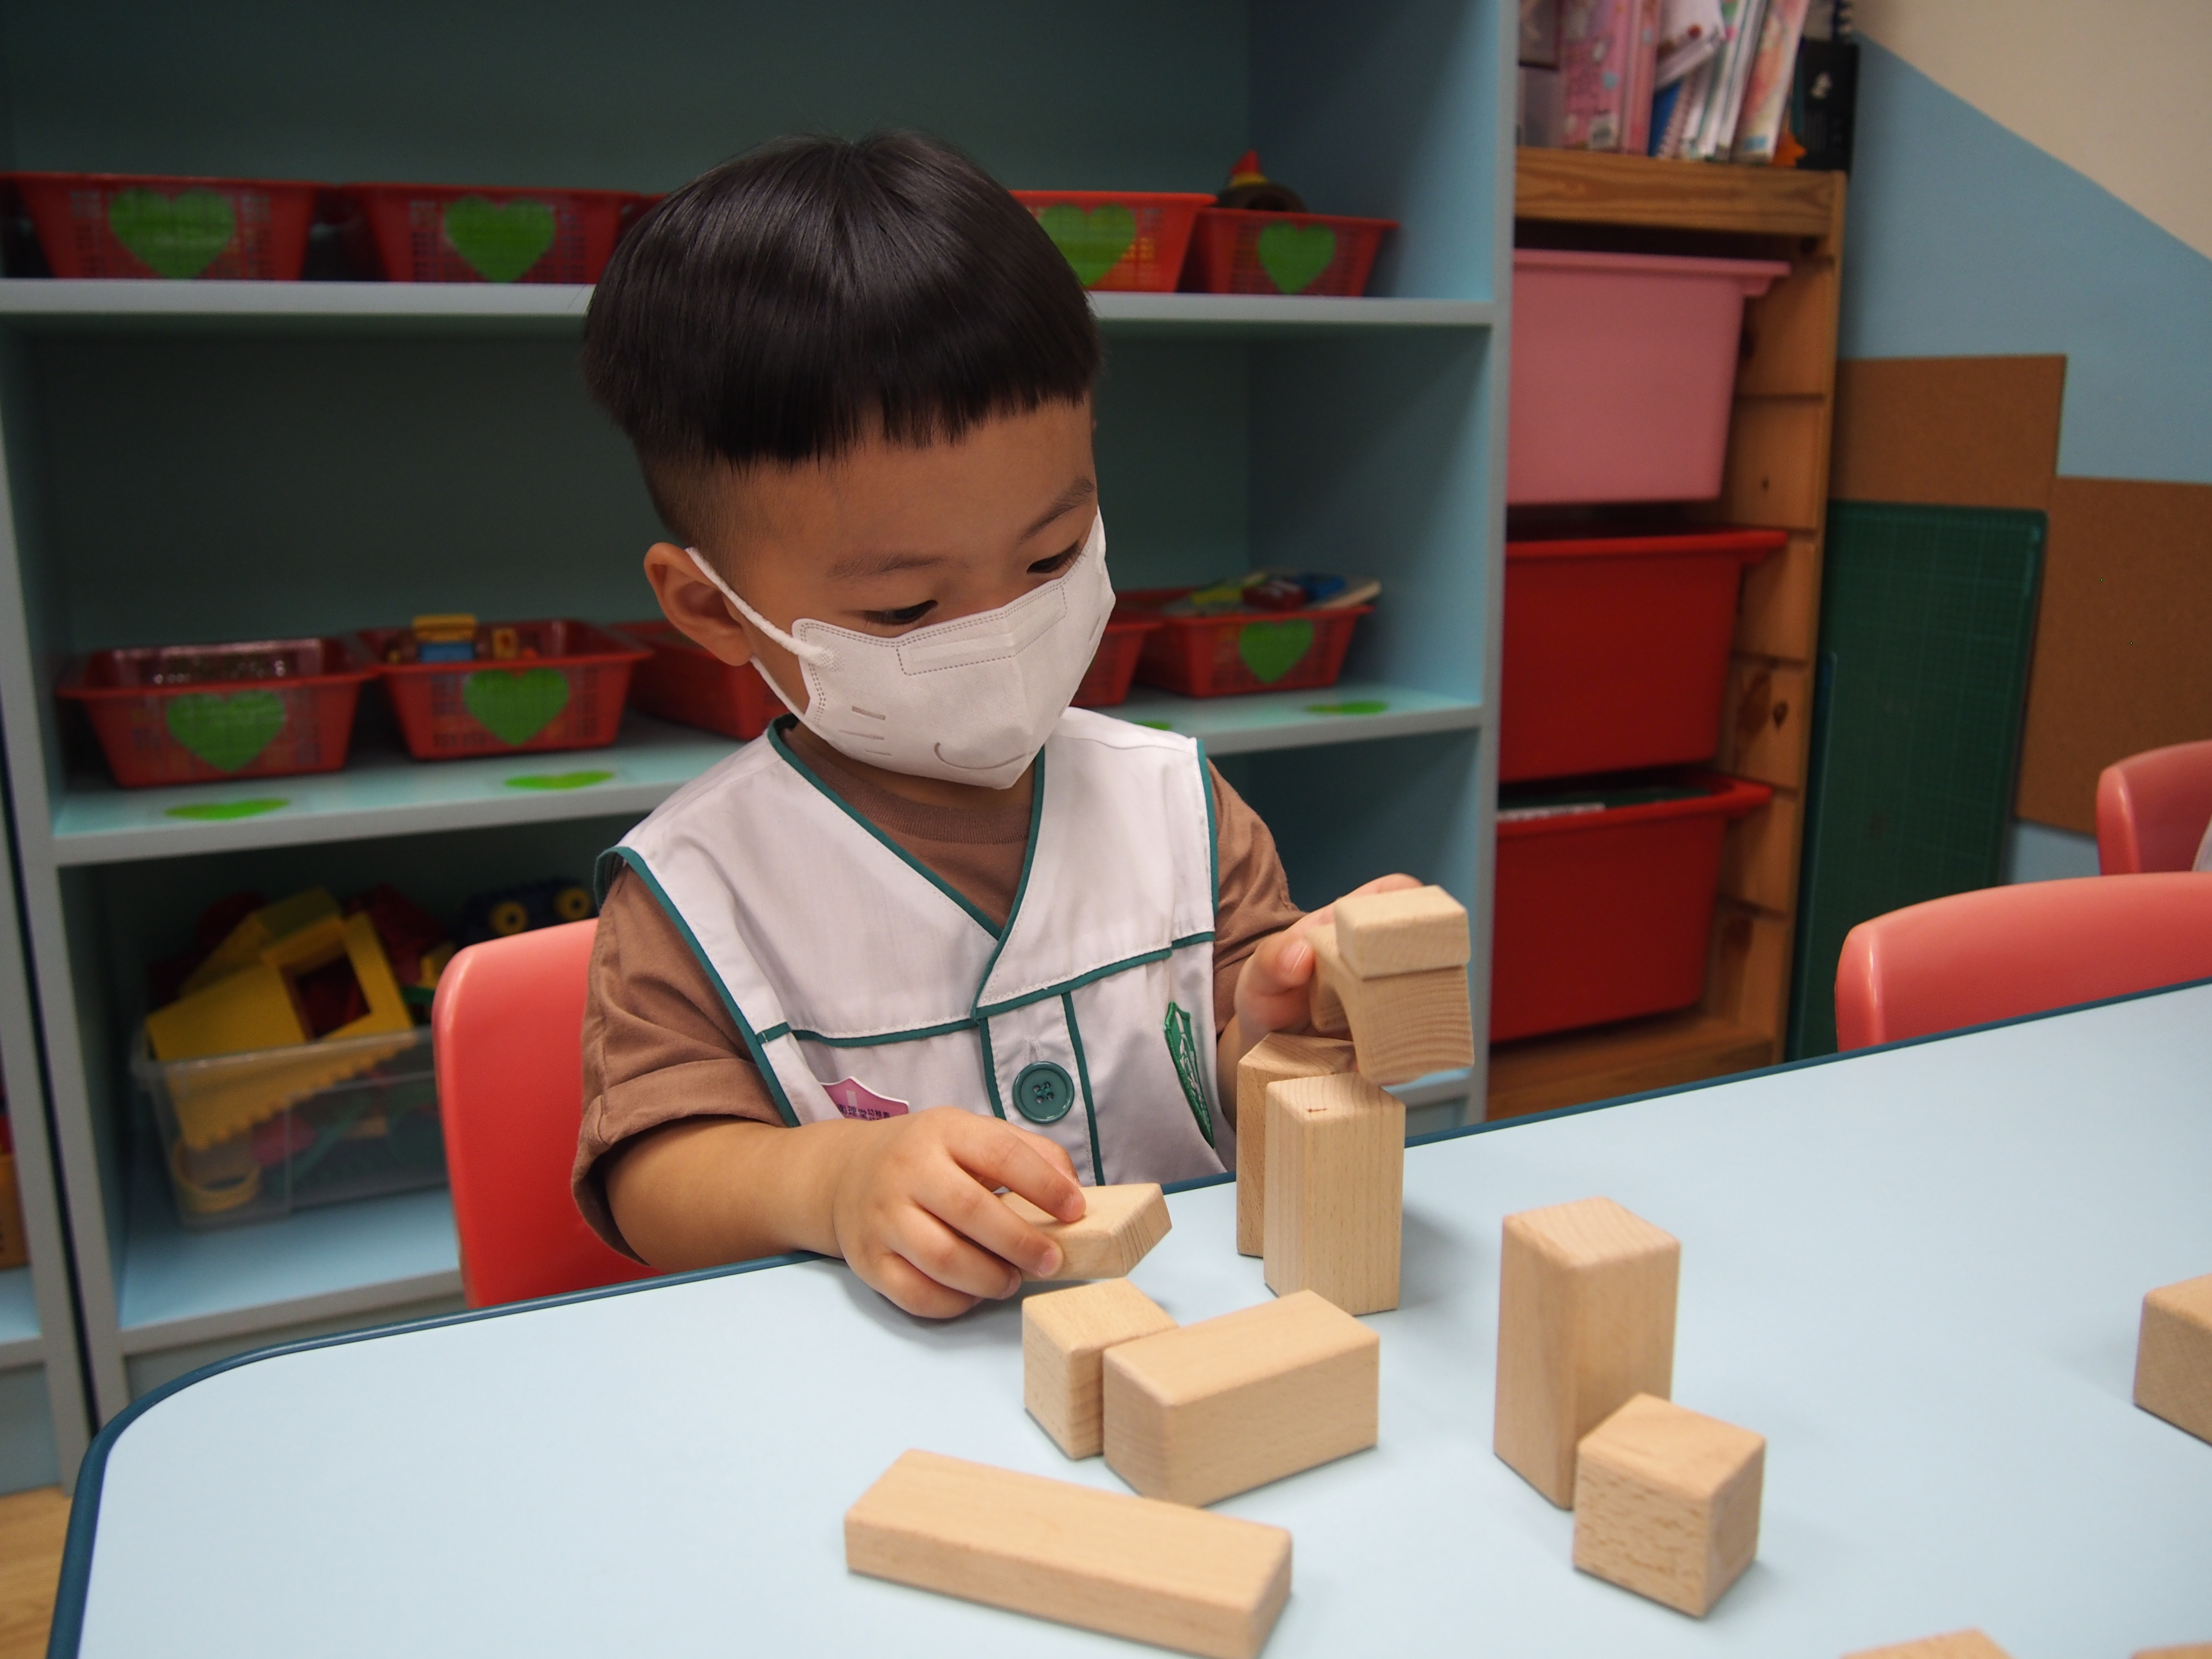 http://npmc.edu.hk/sites/default/files/p1010330.jpg